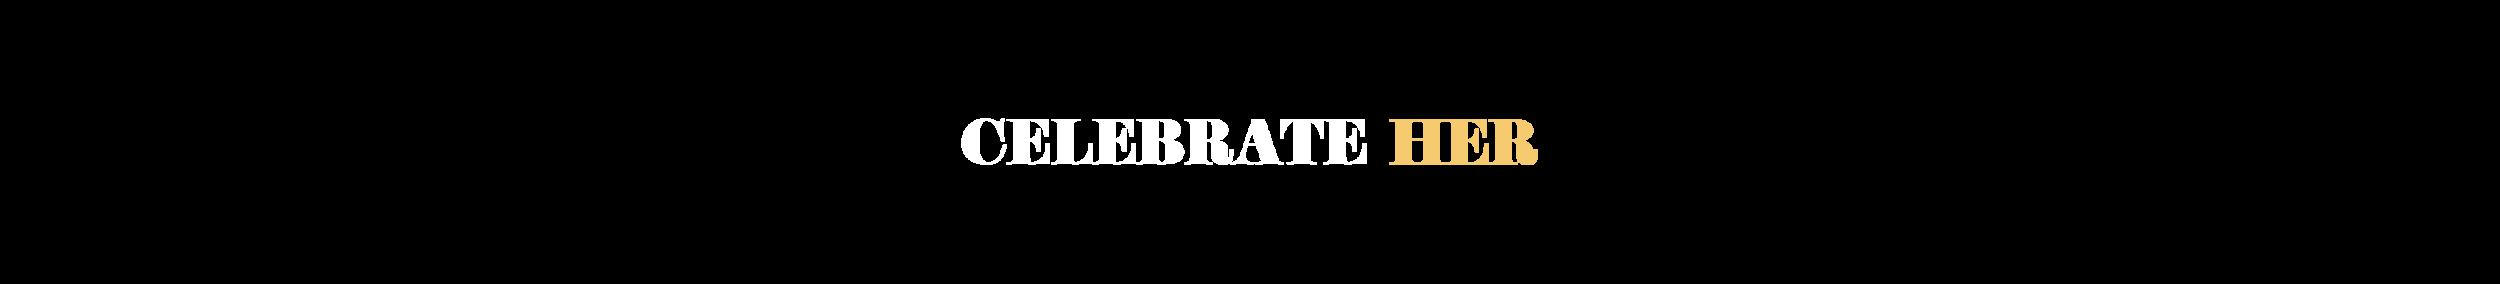 celebrate-her-heading